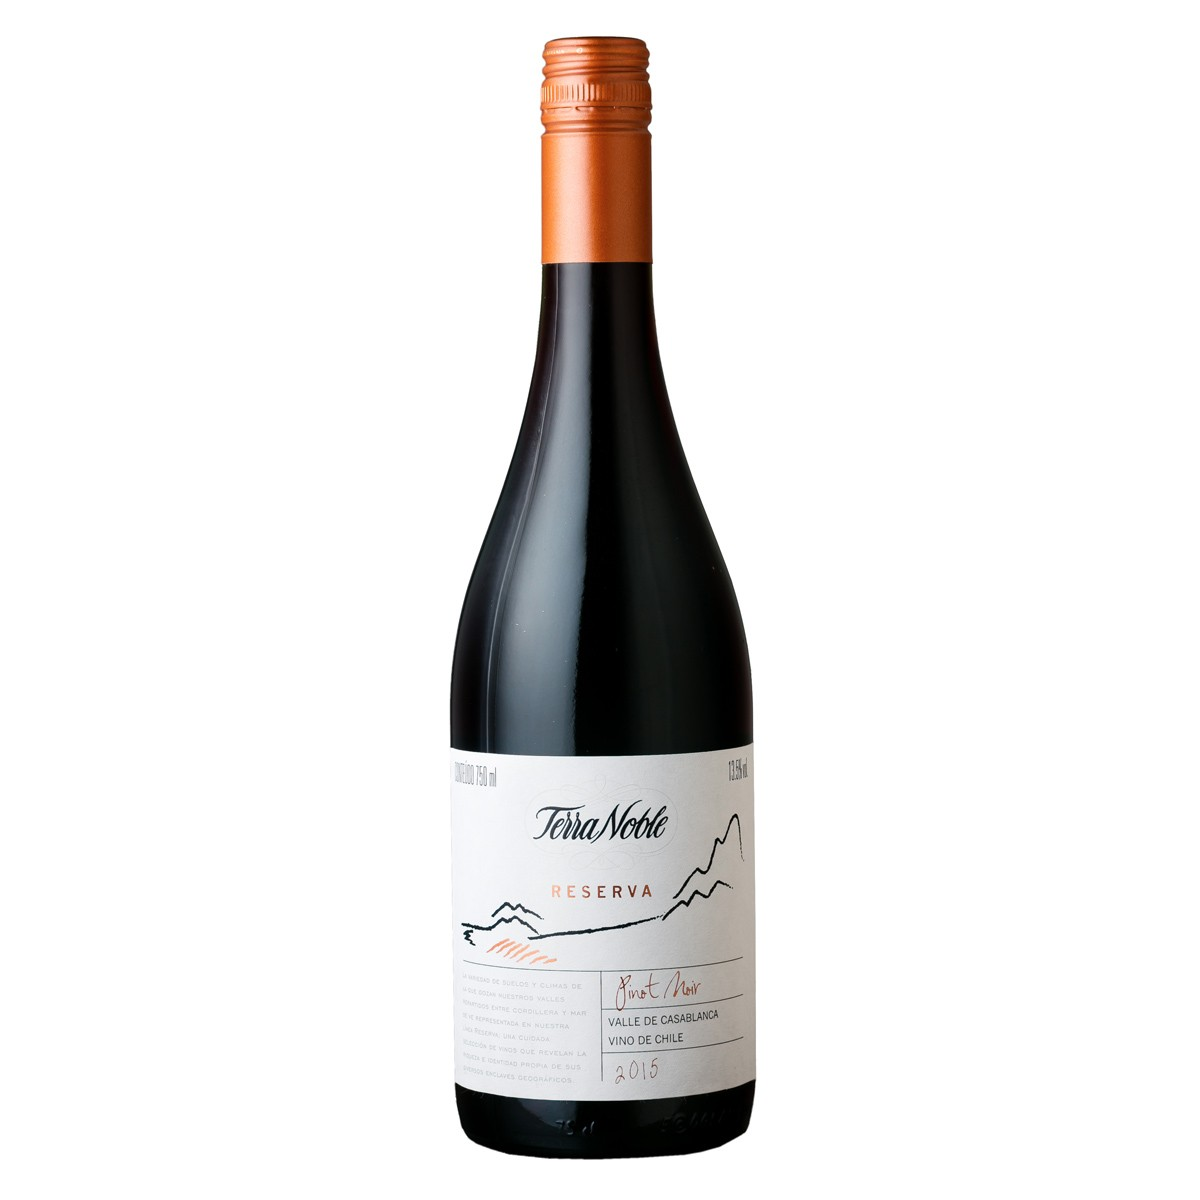 Terranoble Pinot Noir Reserva